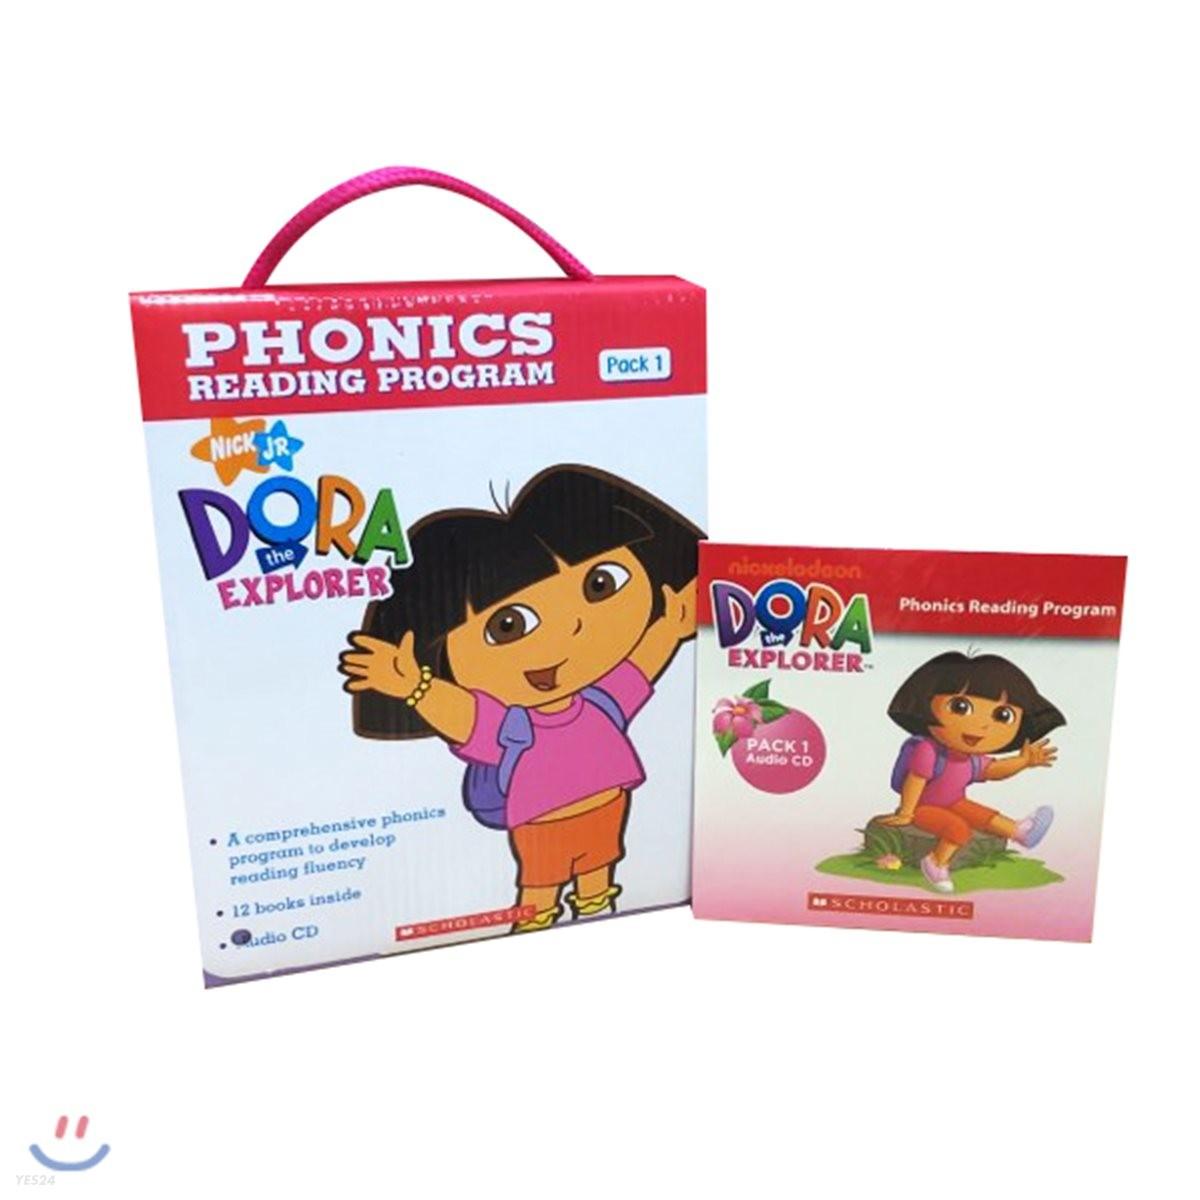 Dora The Explorer Phonics Fun Pack 1 with CD : 도라 파닉스 리더스